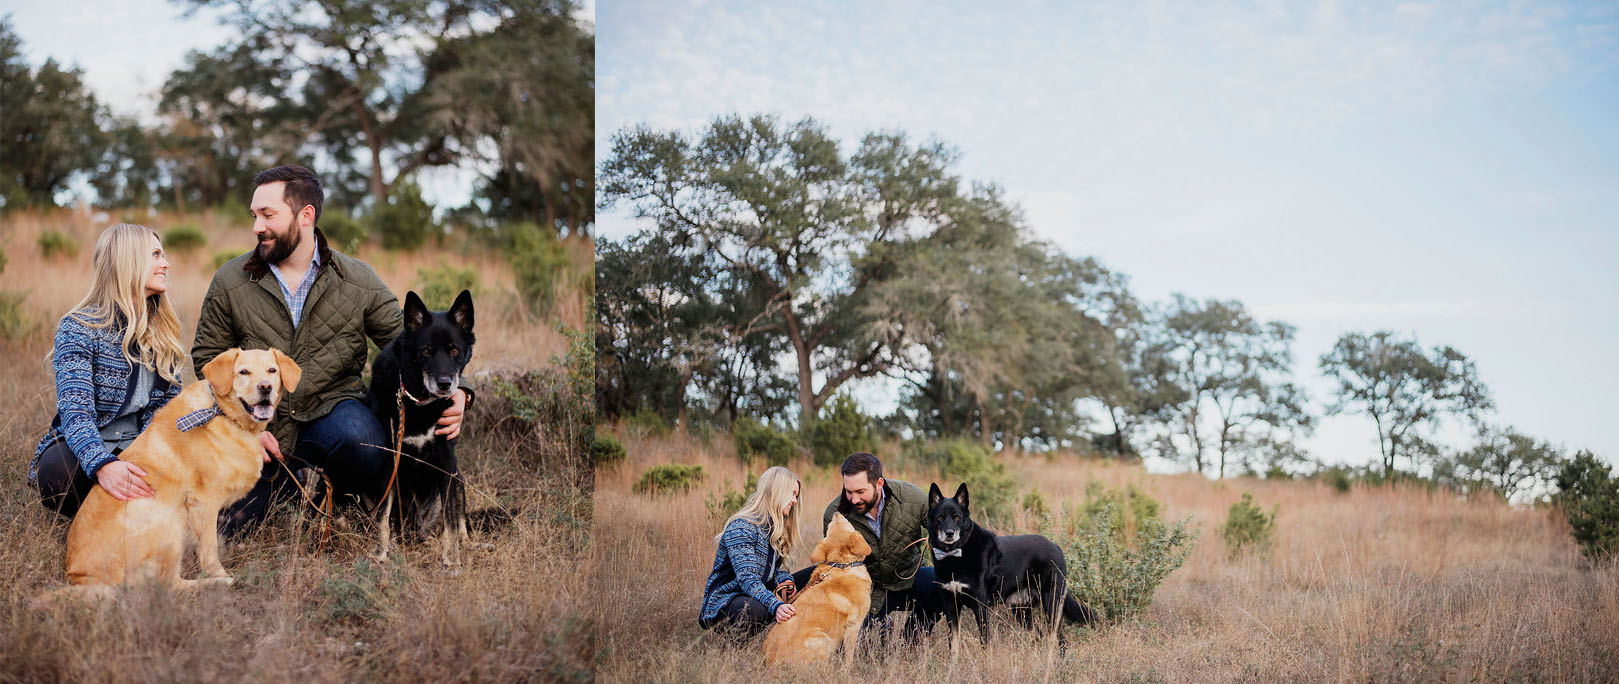 EffJay Photography Kansas City Dog Photographer Family Pictures Fur Babies 012.jpg